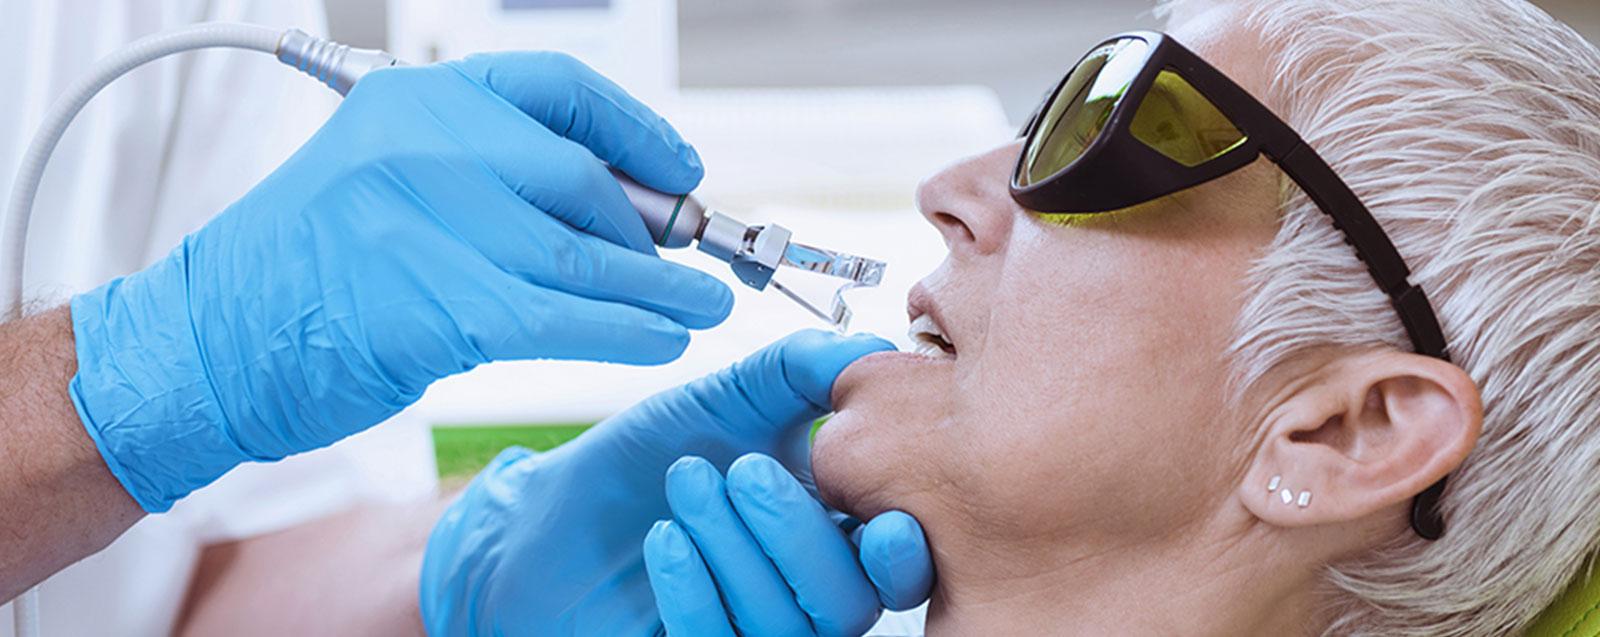 Laser-Behandlung in der Zahnarztpraxis Meling